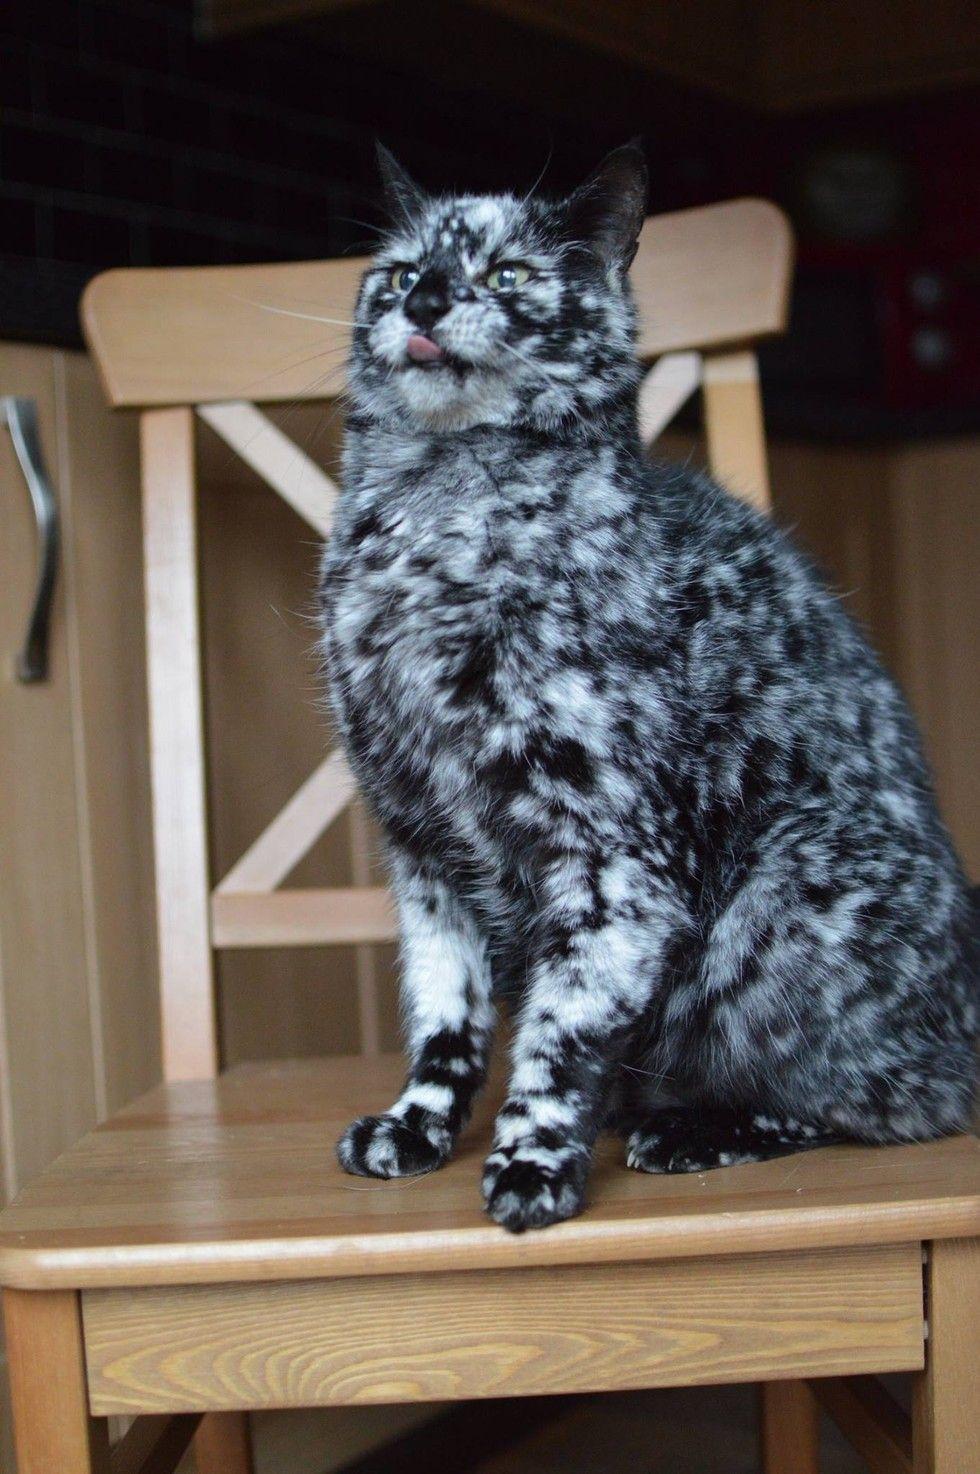 Scrappy Was Born A Black Cat Now Turning White Due To Vitiligo Meet Scrappy The Gatinhos Malhados Gatinhos Fofos Animais Adoraveis